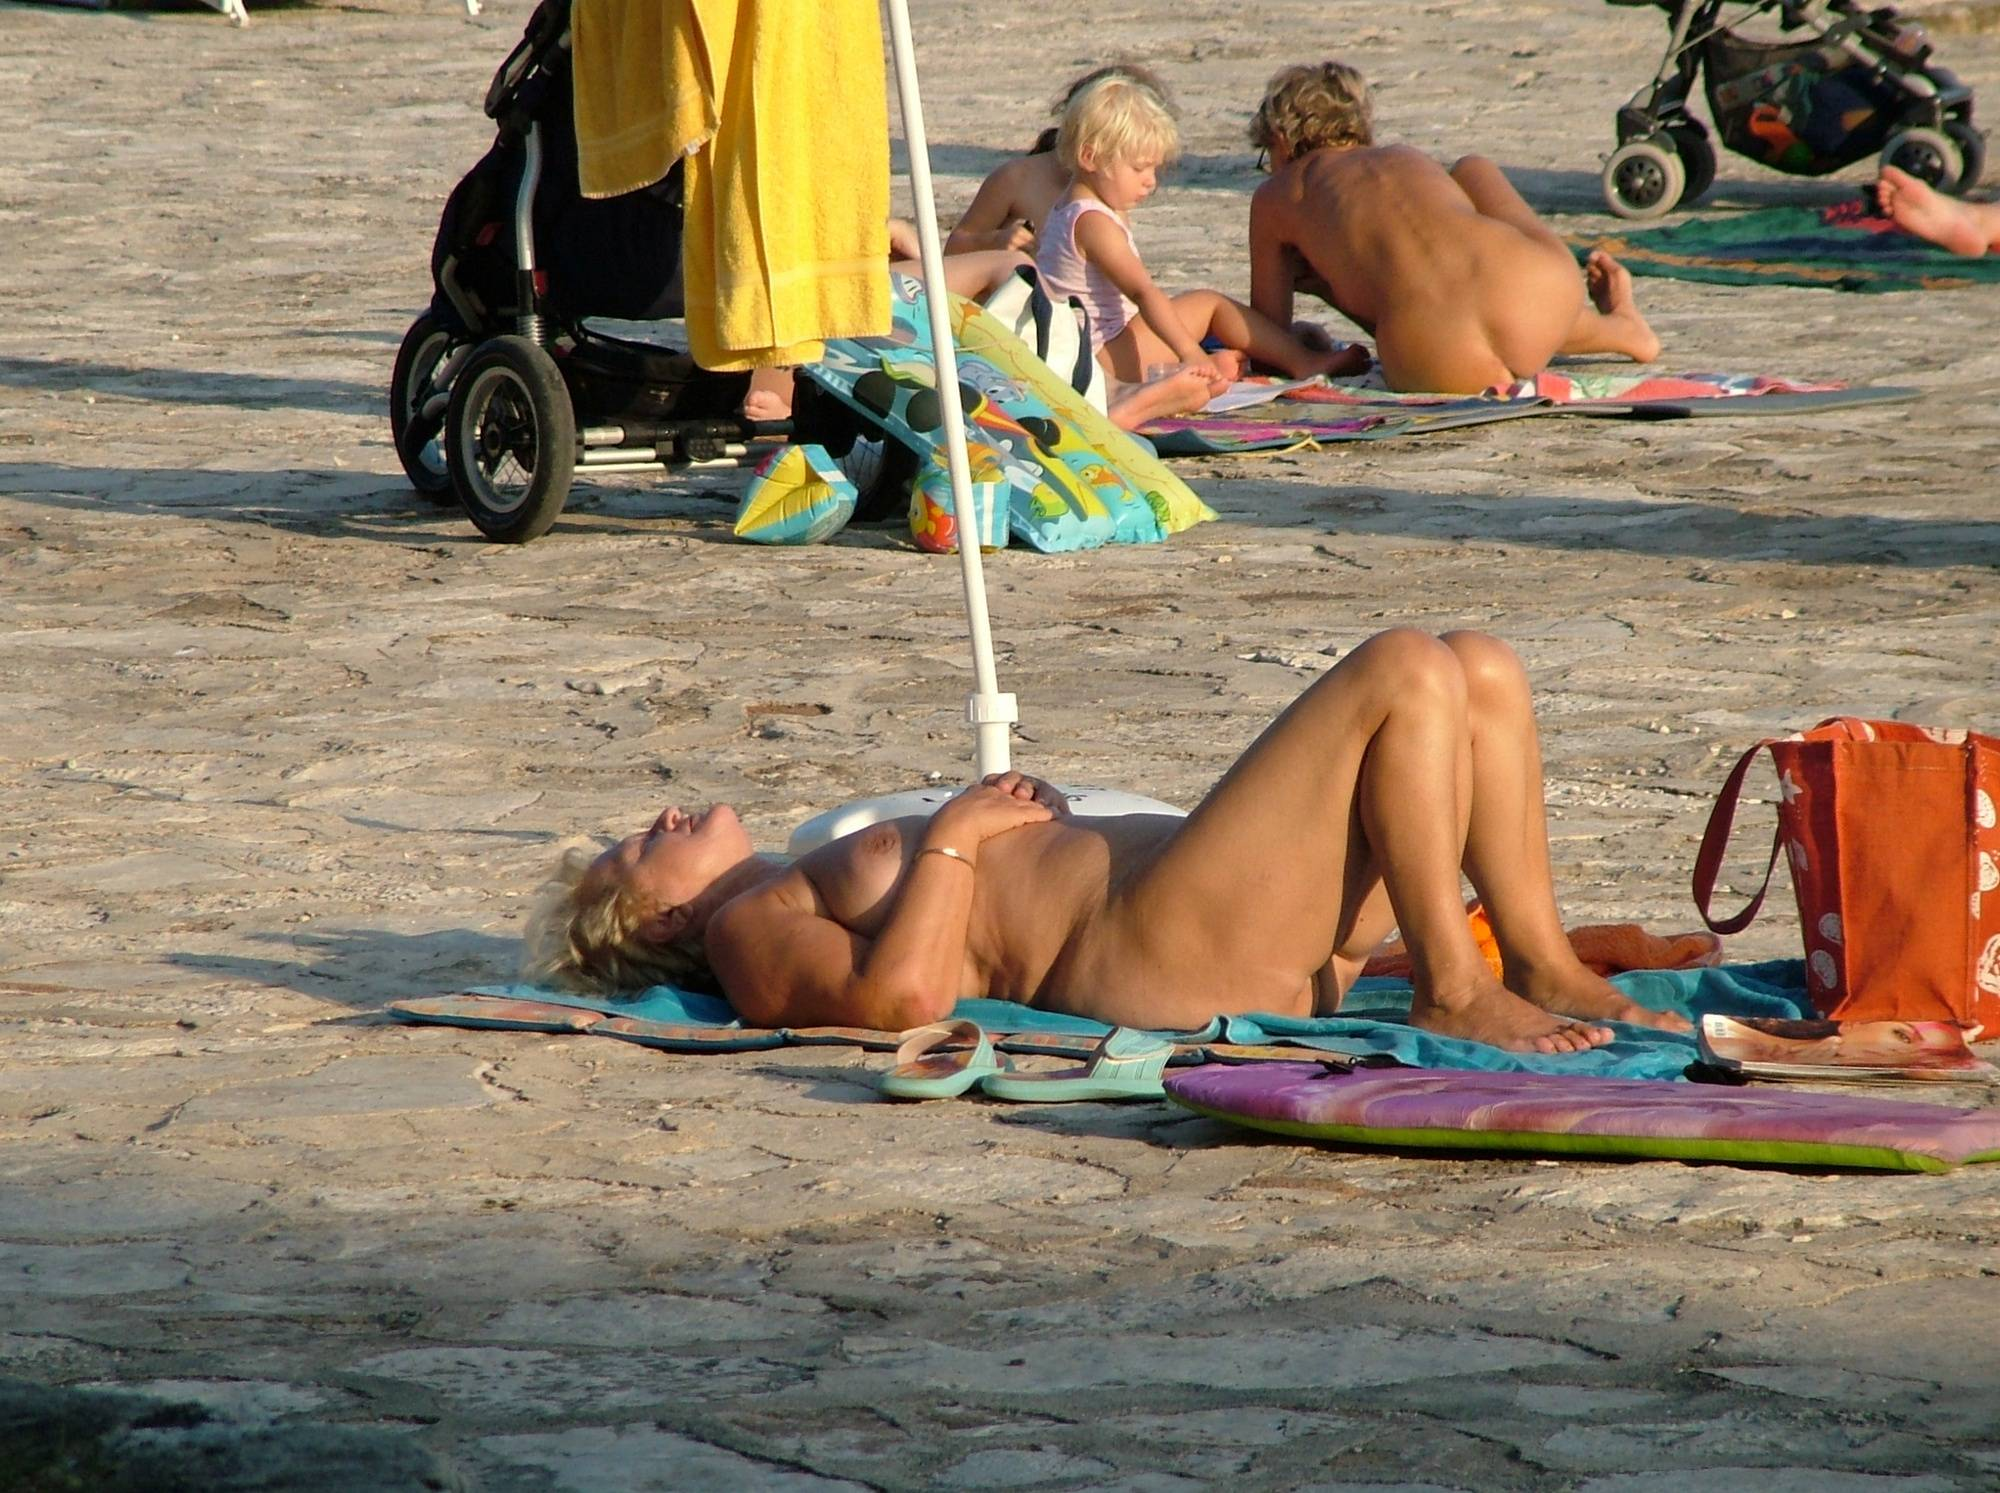 Nudist Pictures FKK Reflection Sun Beach - 1